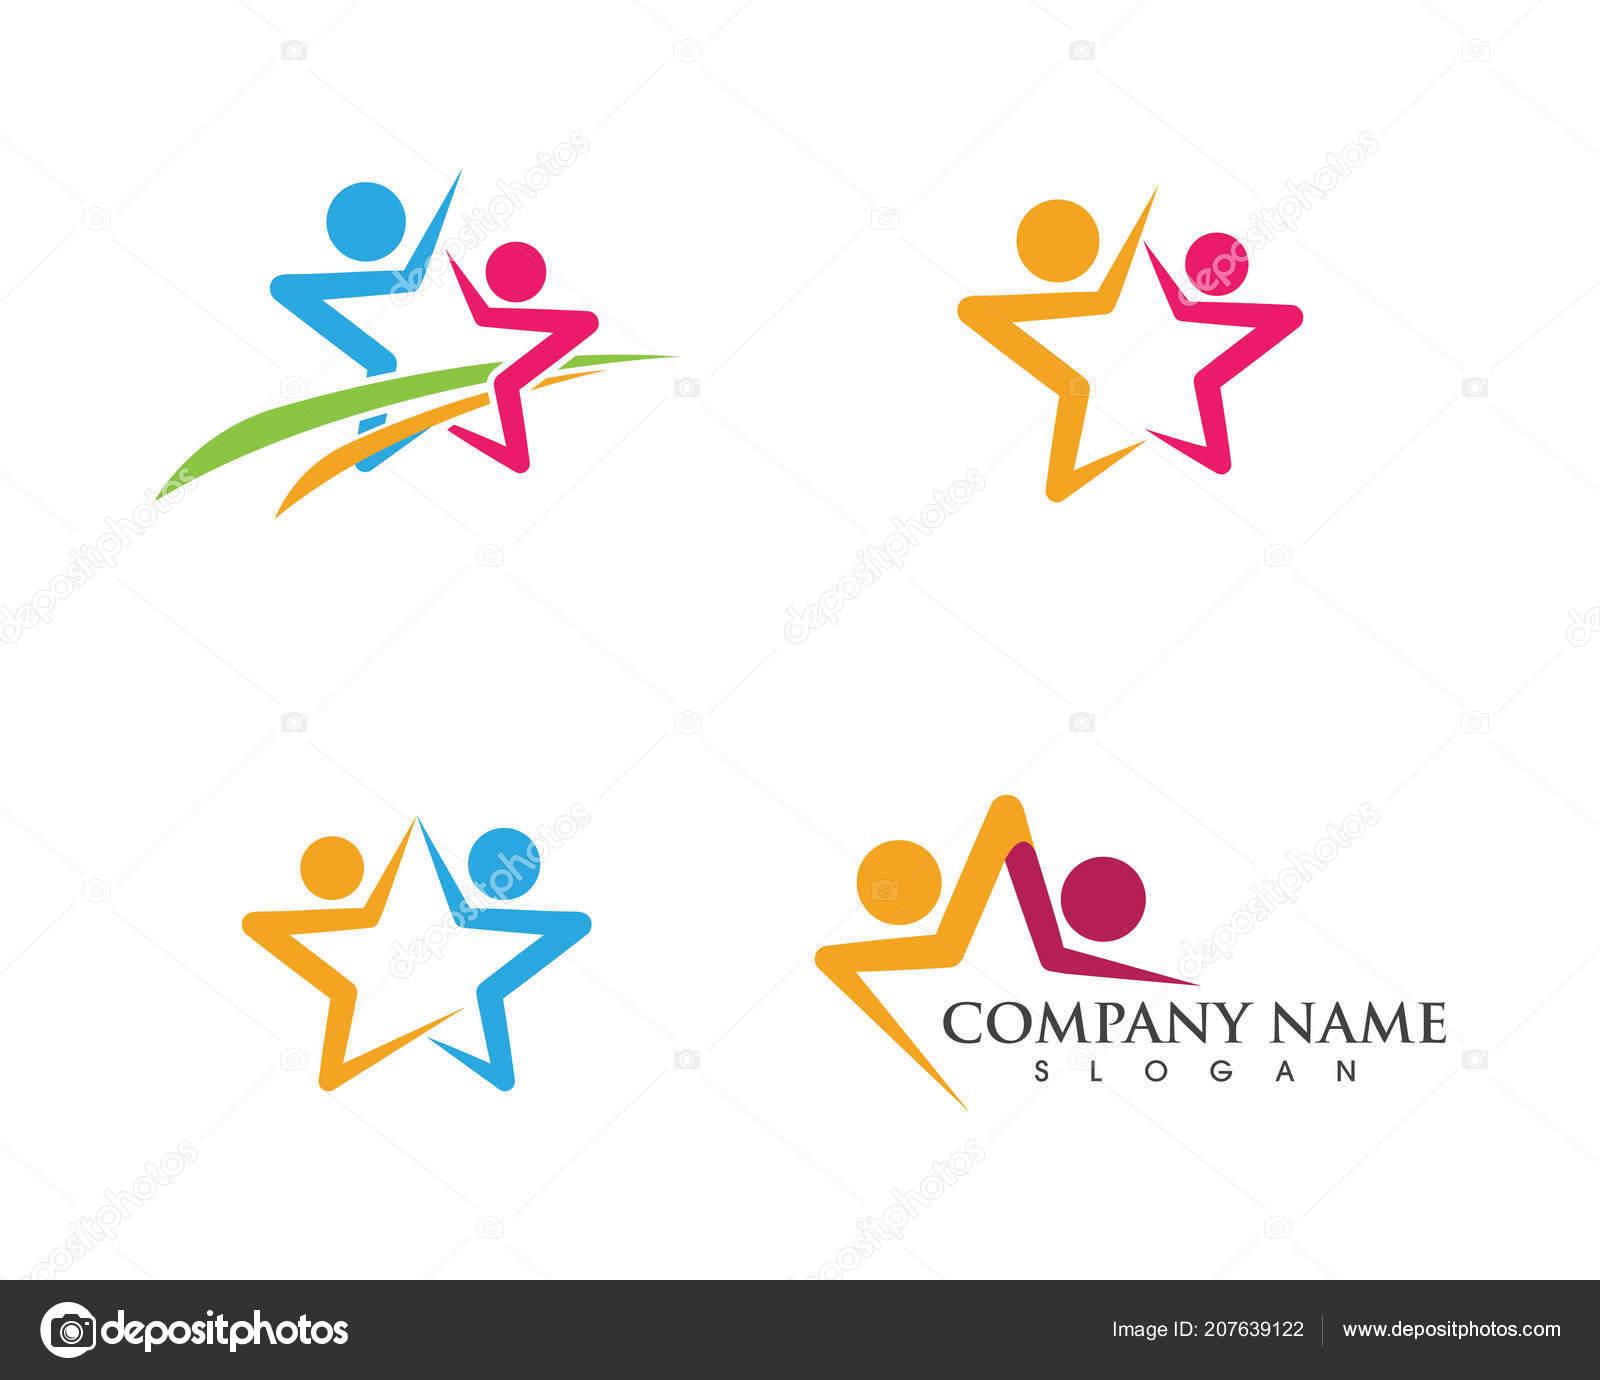 star community network social icon design template ストック